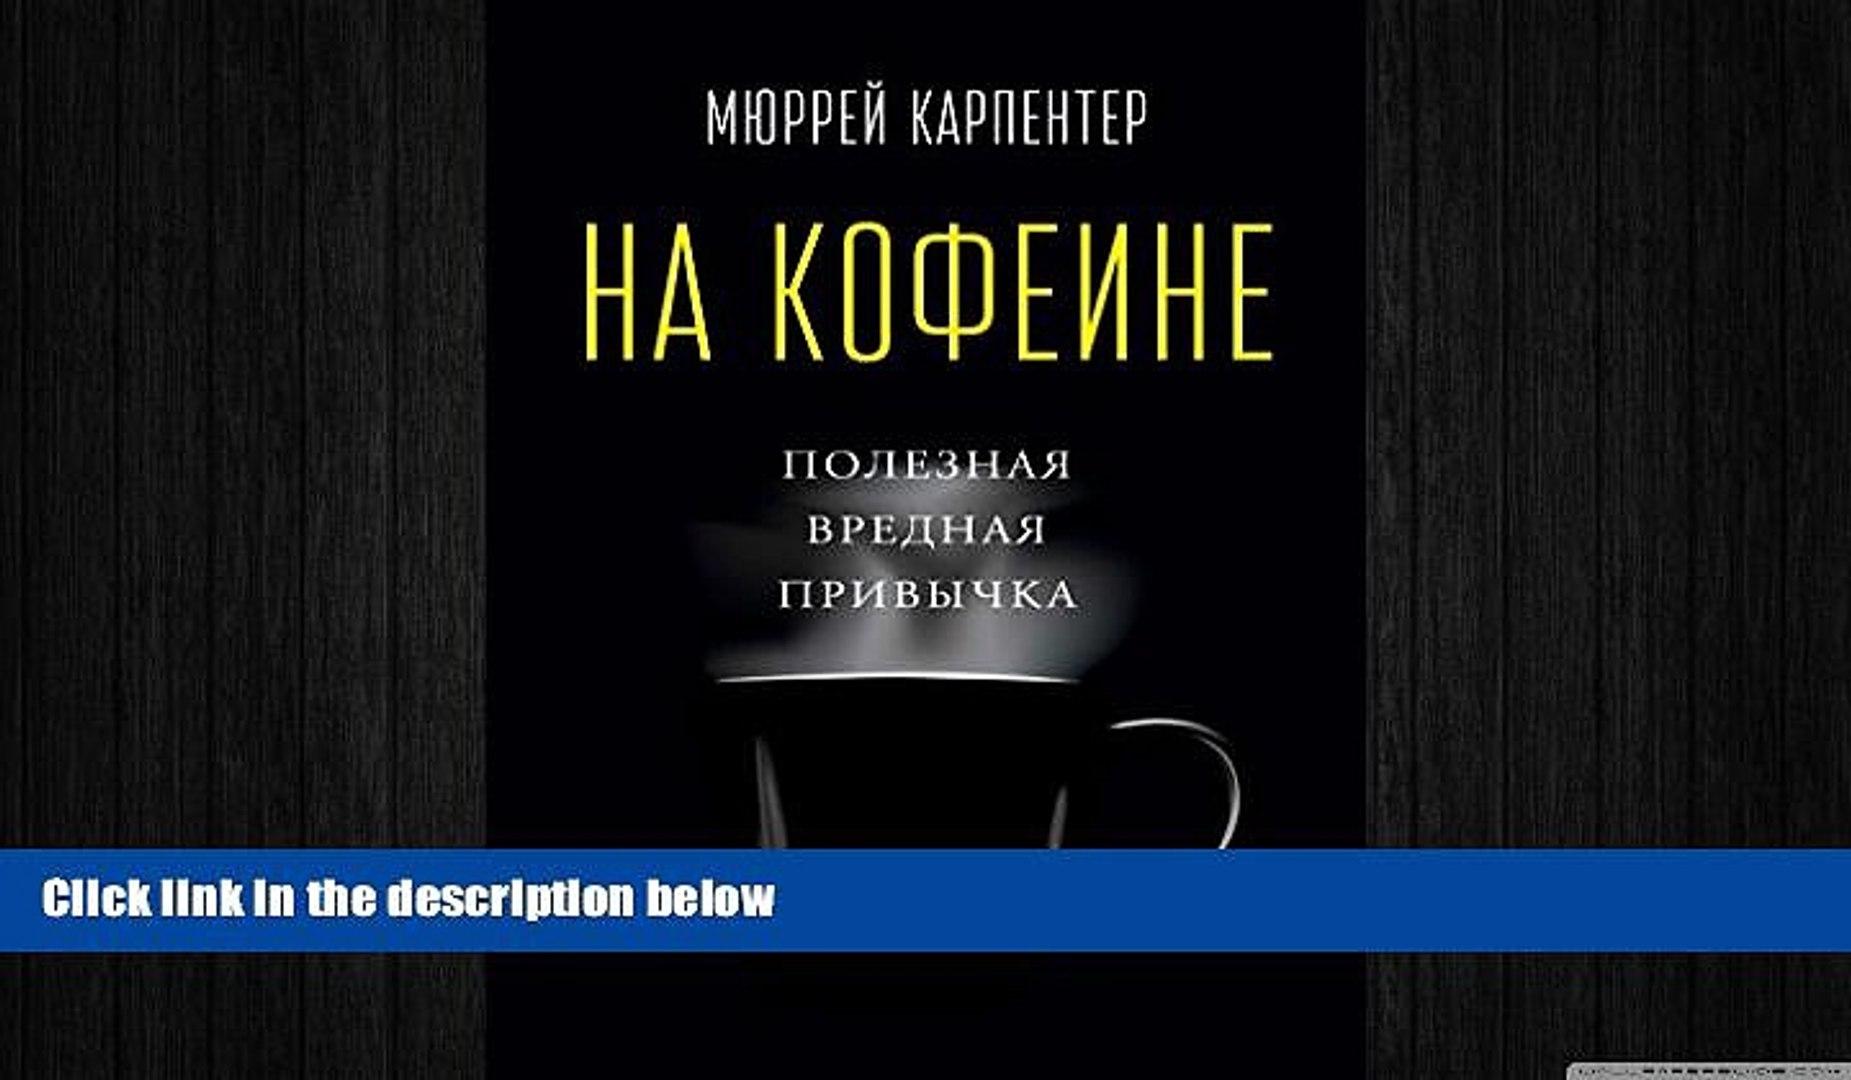 different   �а кофеине: Полезна� вредна� привычка (Russian Edition)